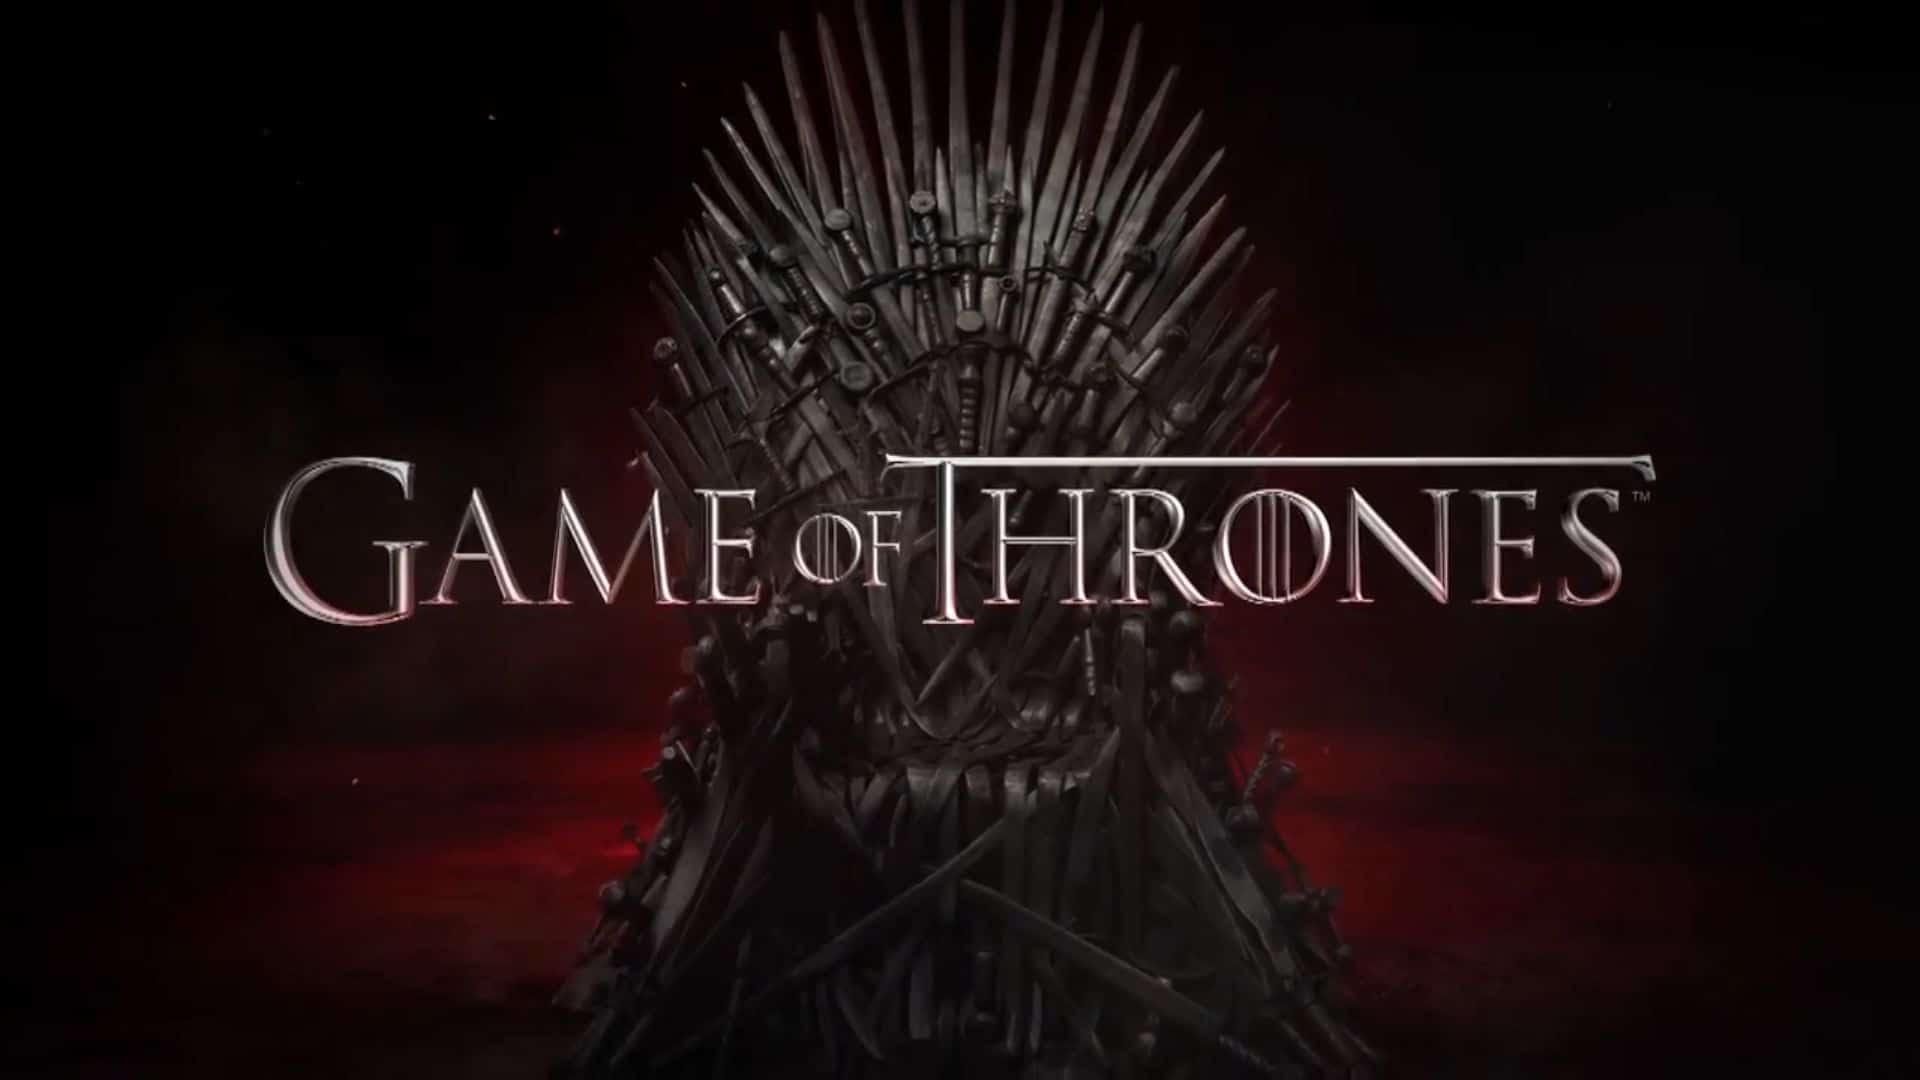 Une sneakers Game of Thrones en édition limitée !